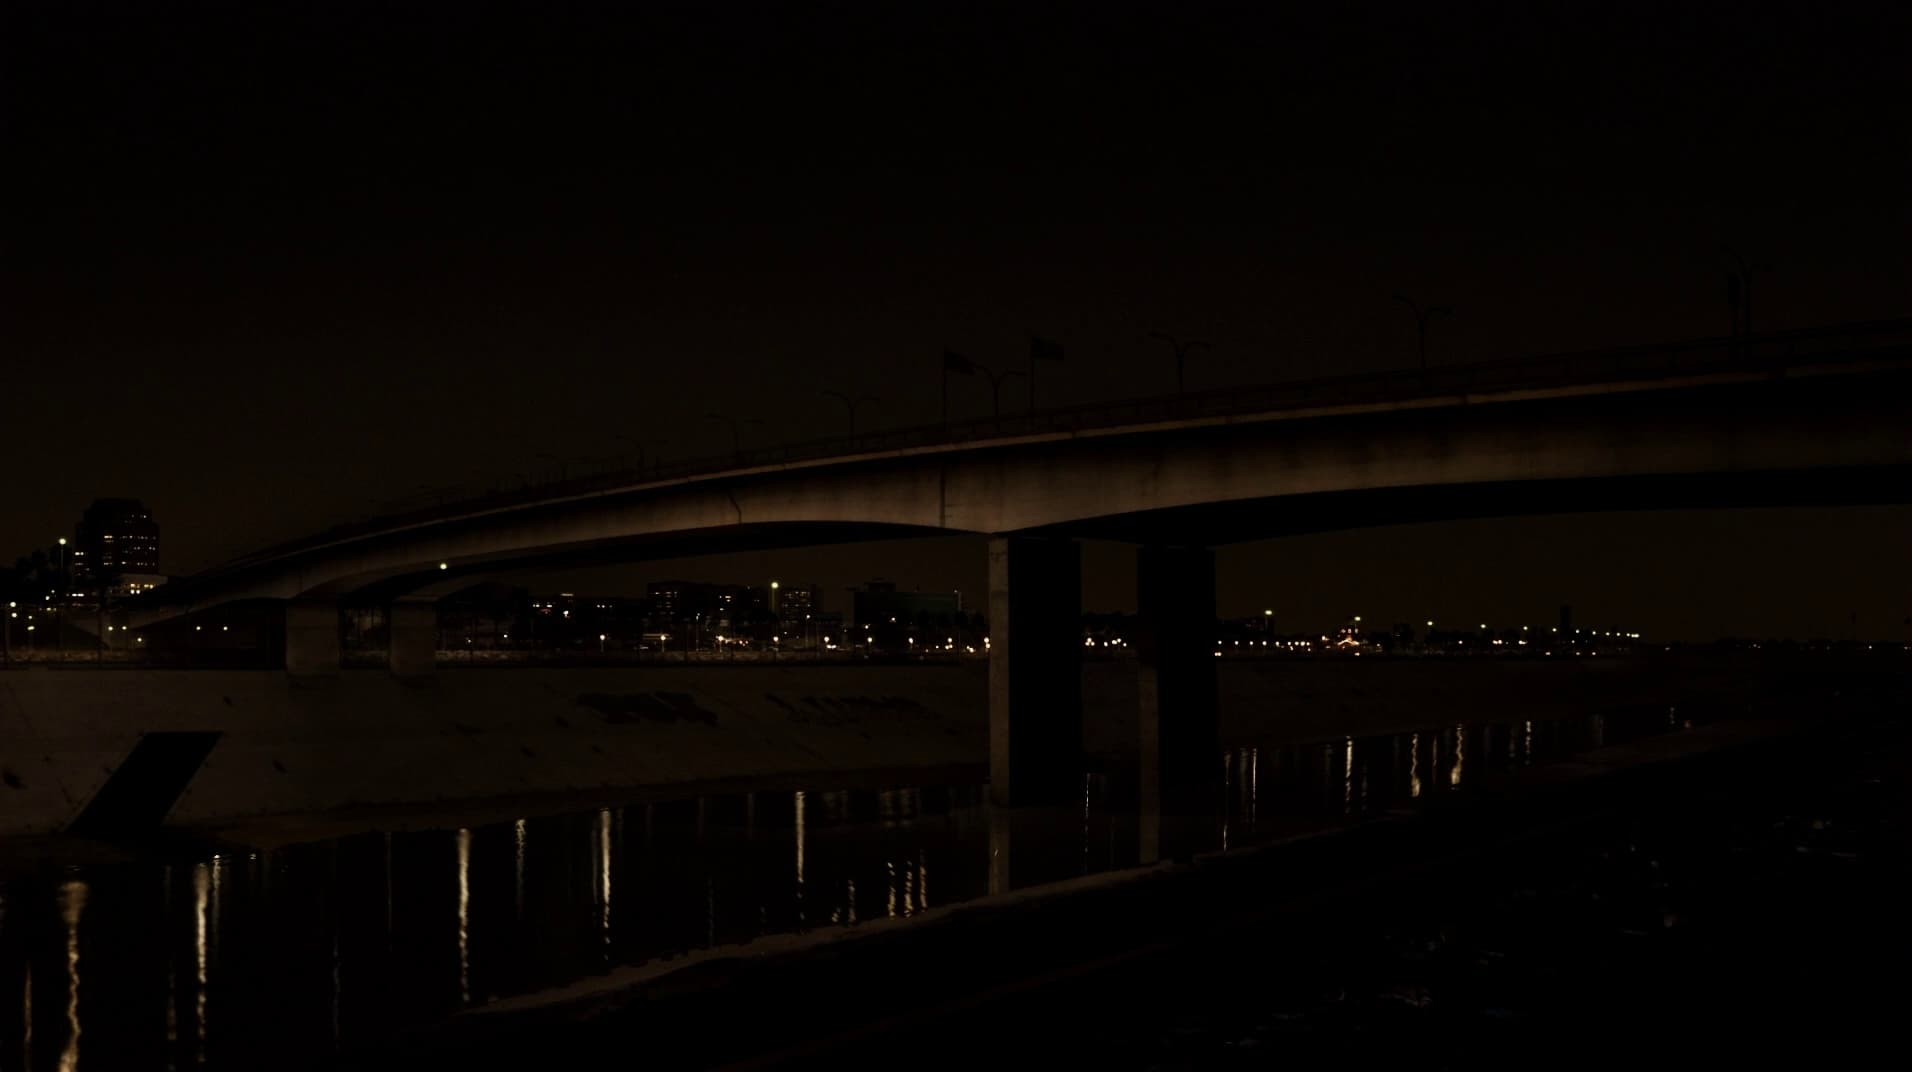 The Bridge: Season 1 Episode 1 Subtitles | The Bridge S01E01